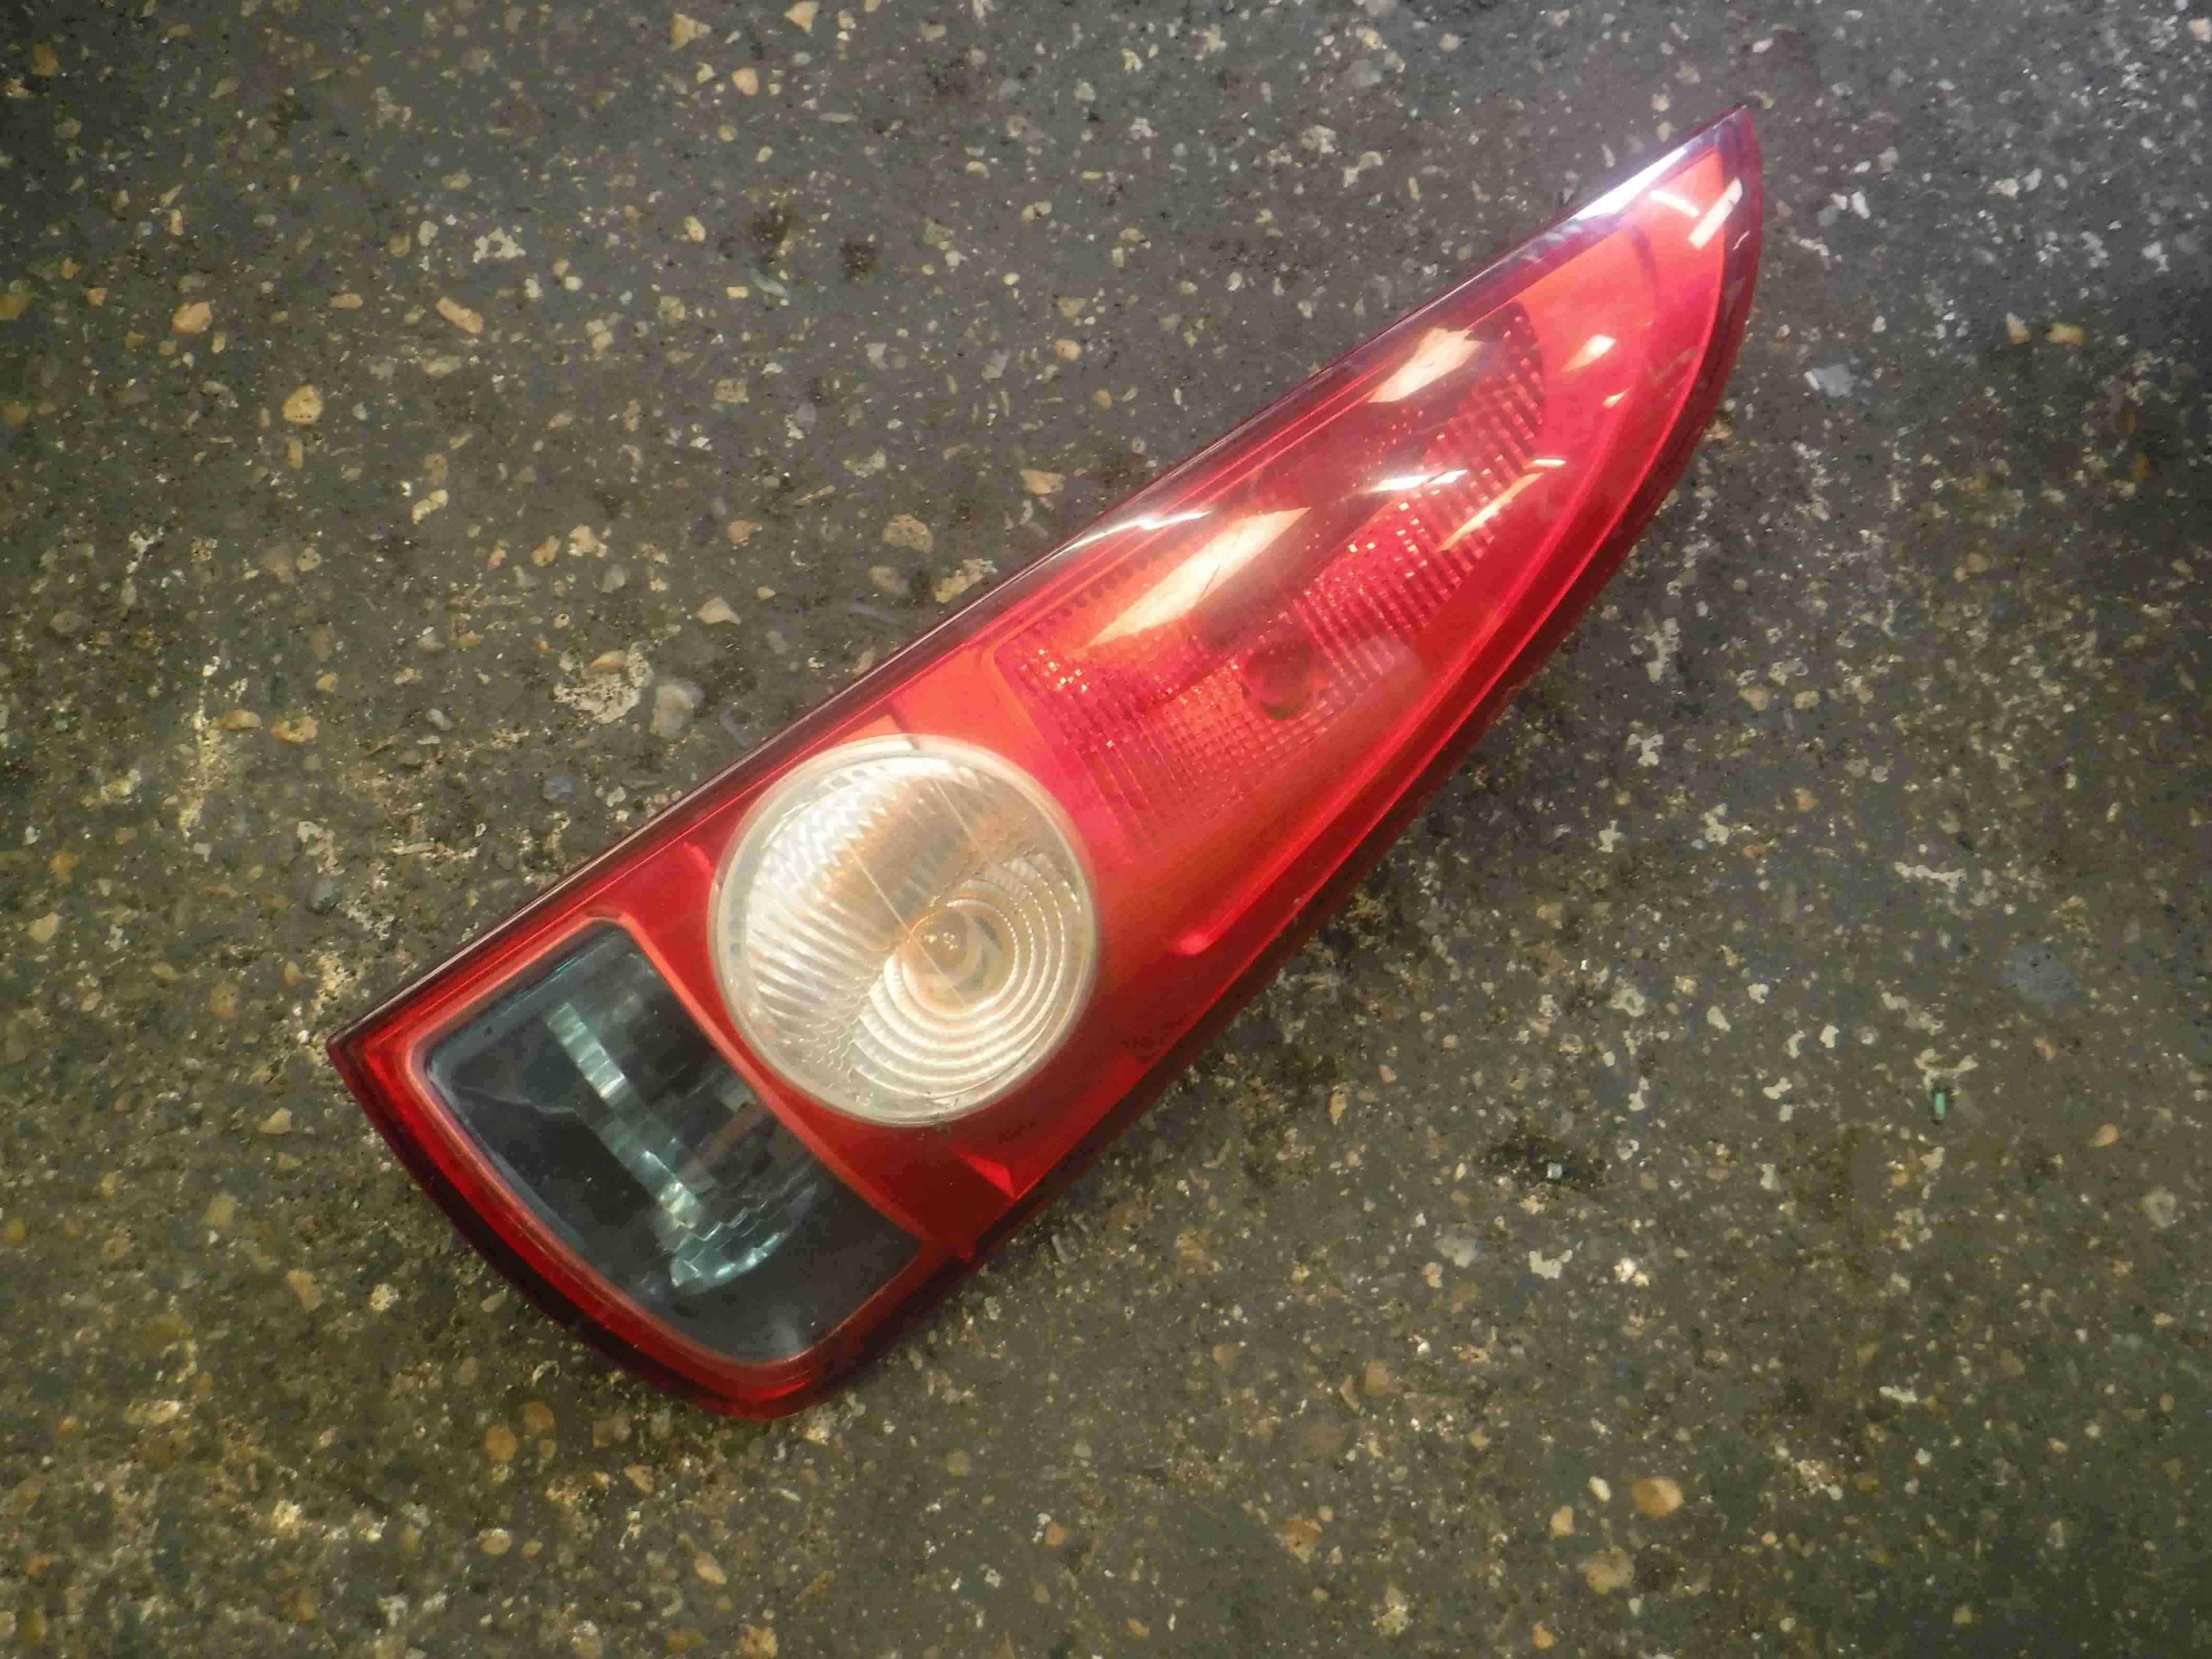 Renault Espace 2003-2013 Drivers OSR Rear Light 8200027152